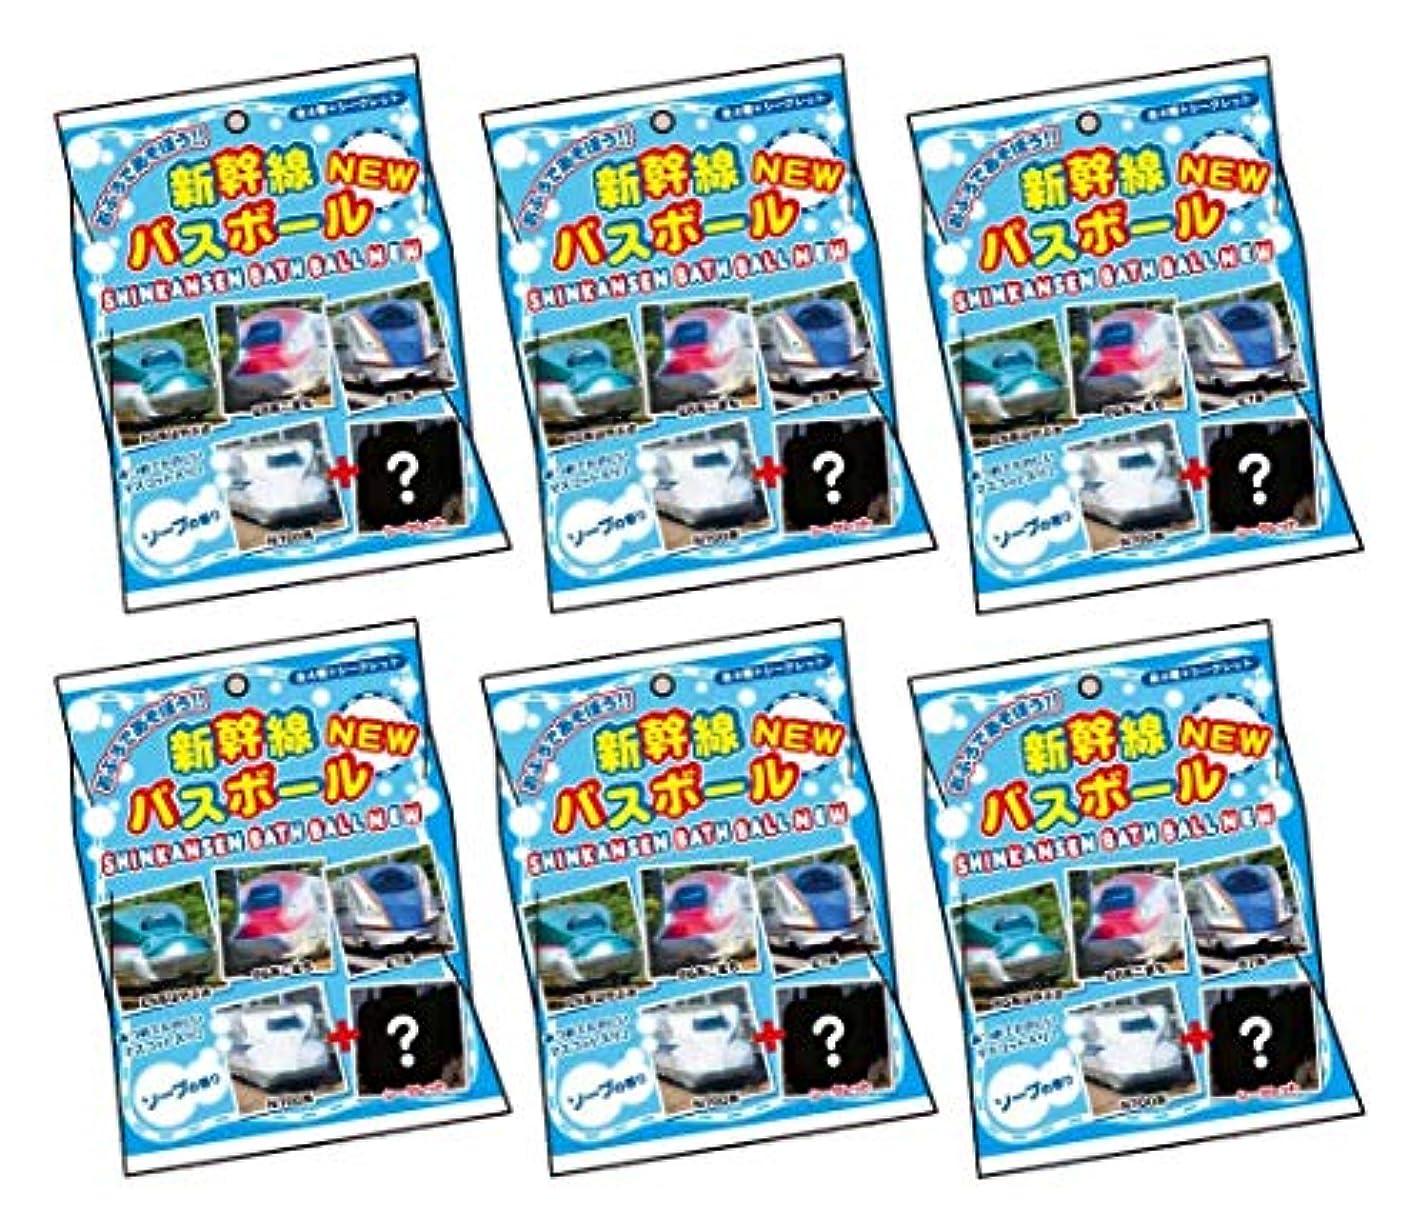 JR新幹線 入浴剤 マスコットが飛び出るバスボール NEW 【6個セット】